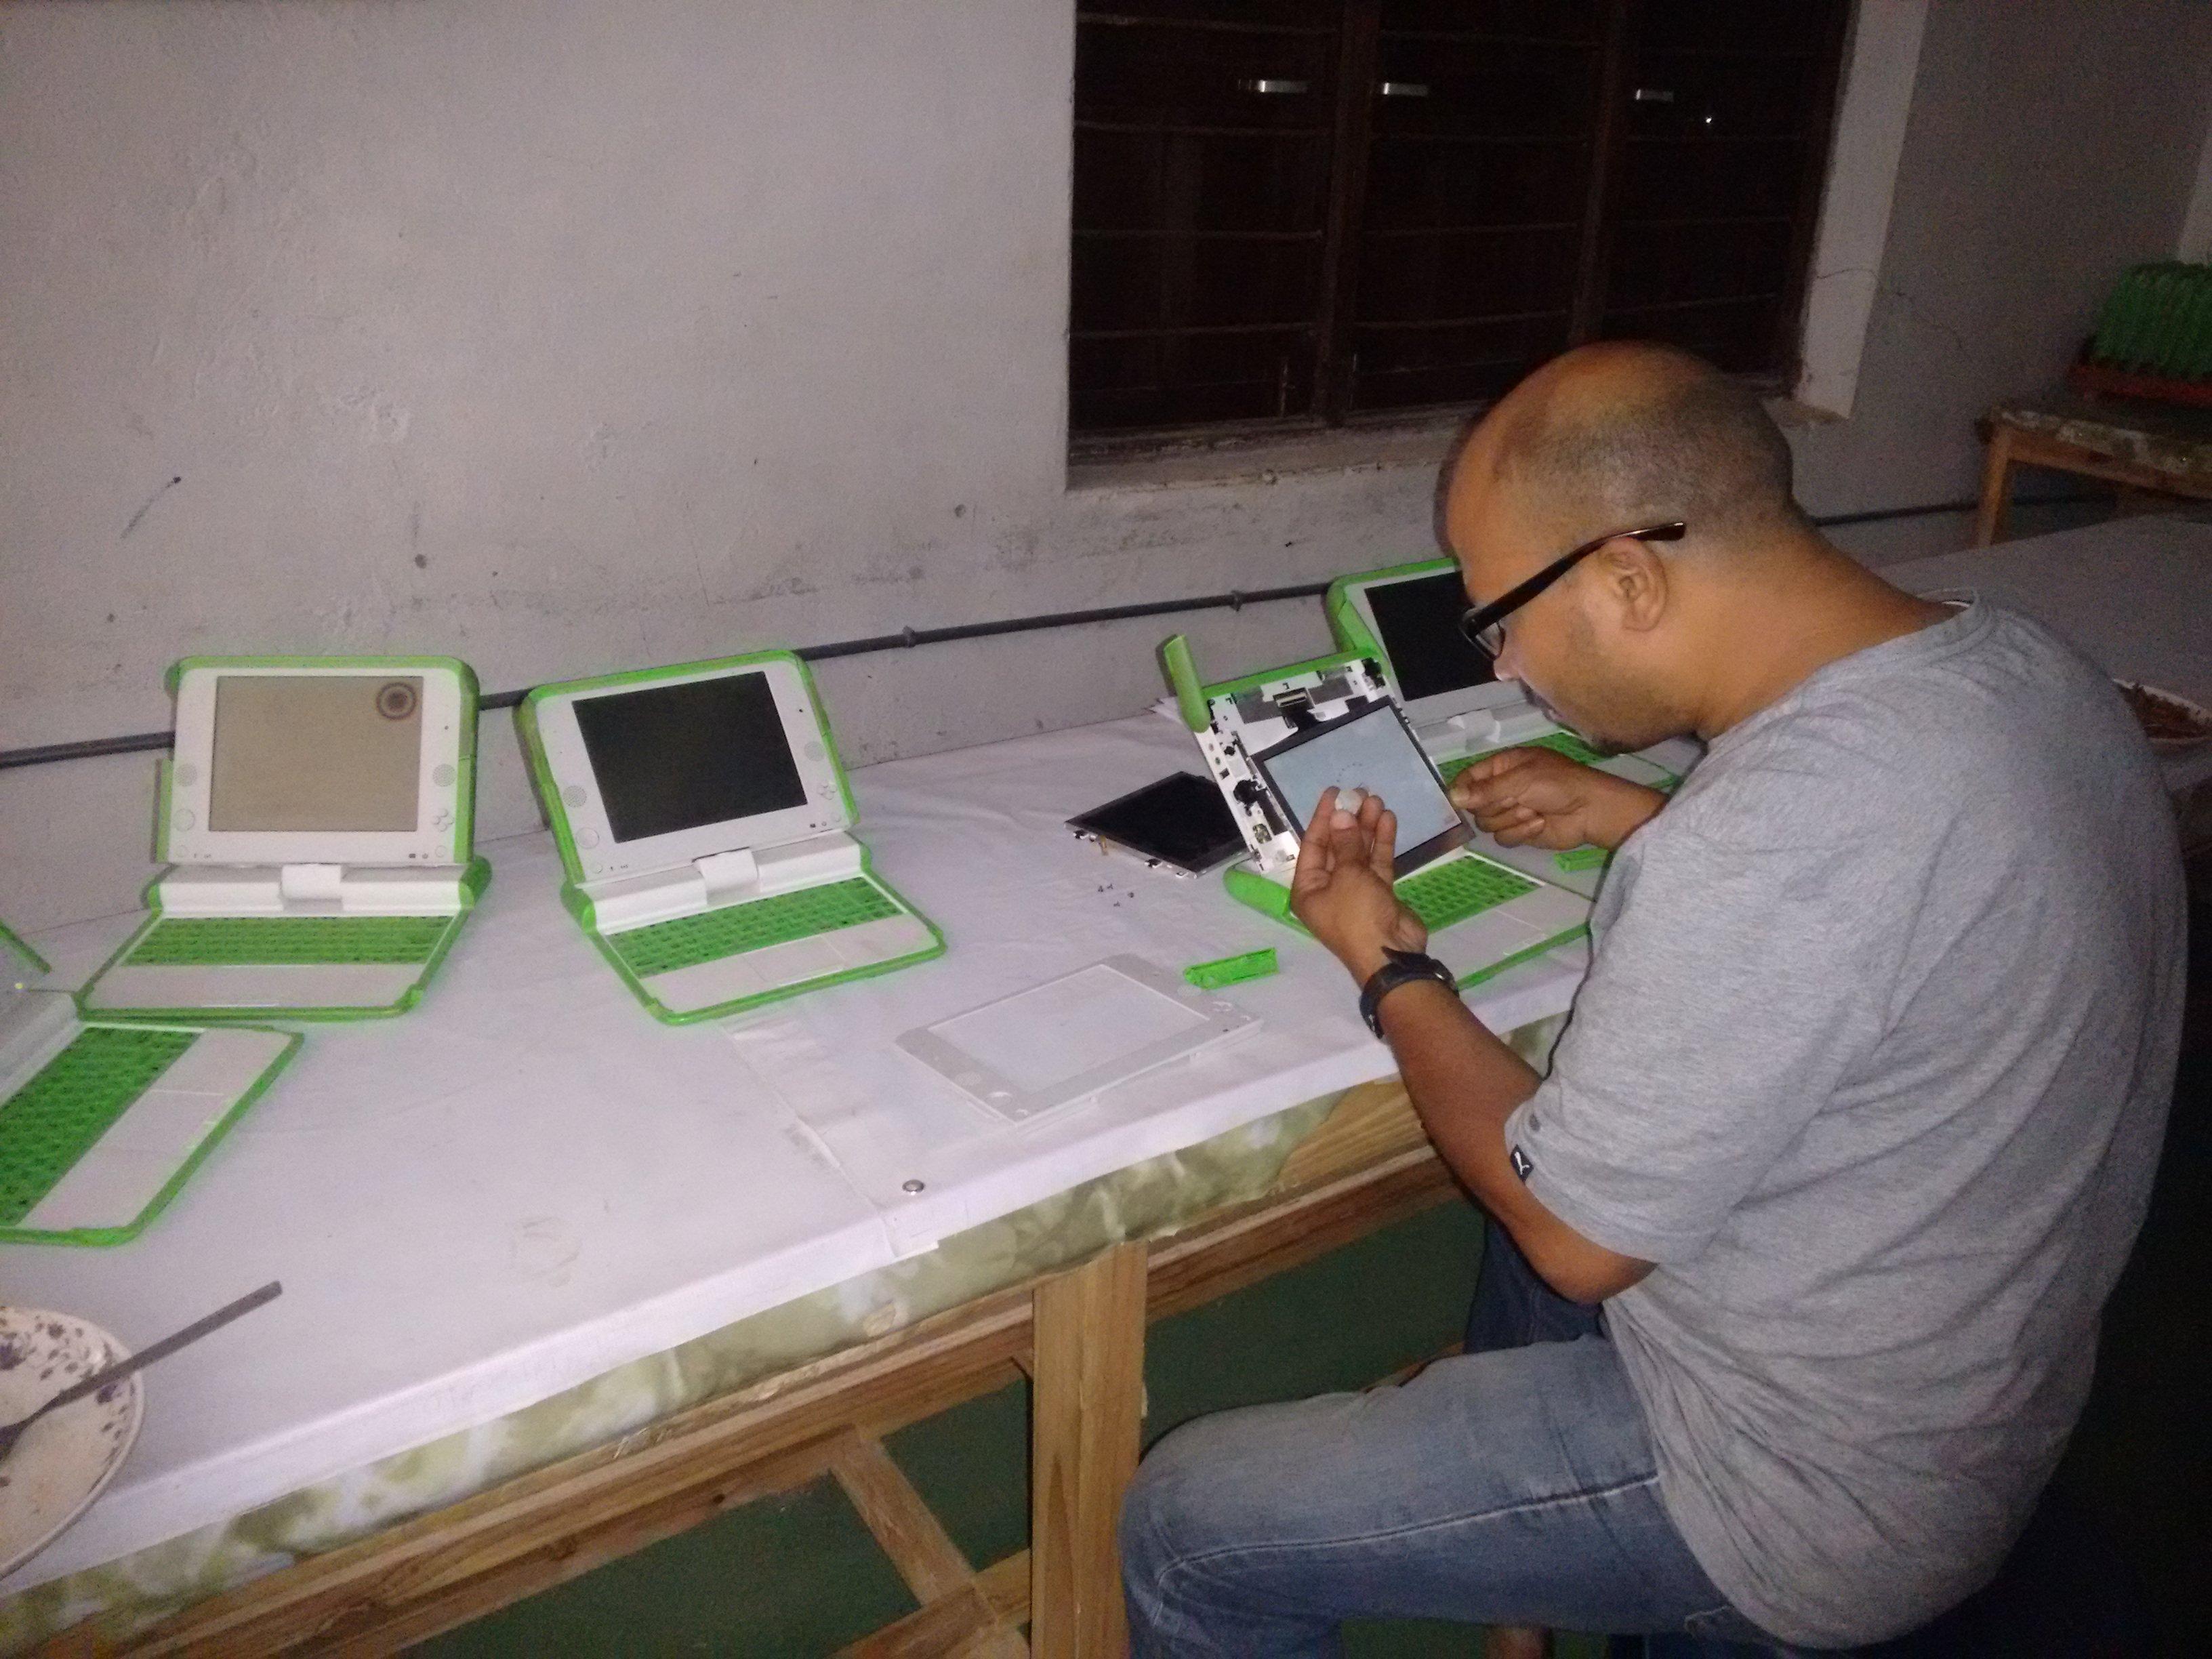 OLE Nepal's technical team member repairing damaged laptop screens in Mahendra Higher Secondary School in Baglung.